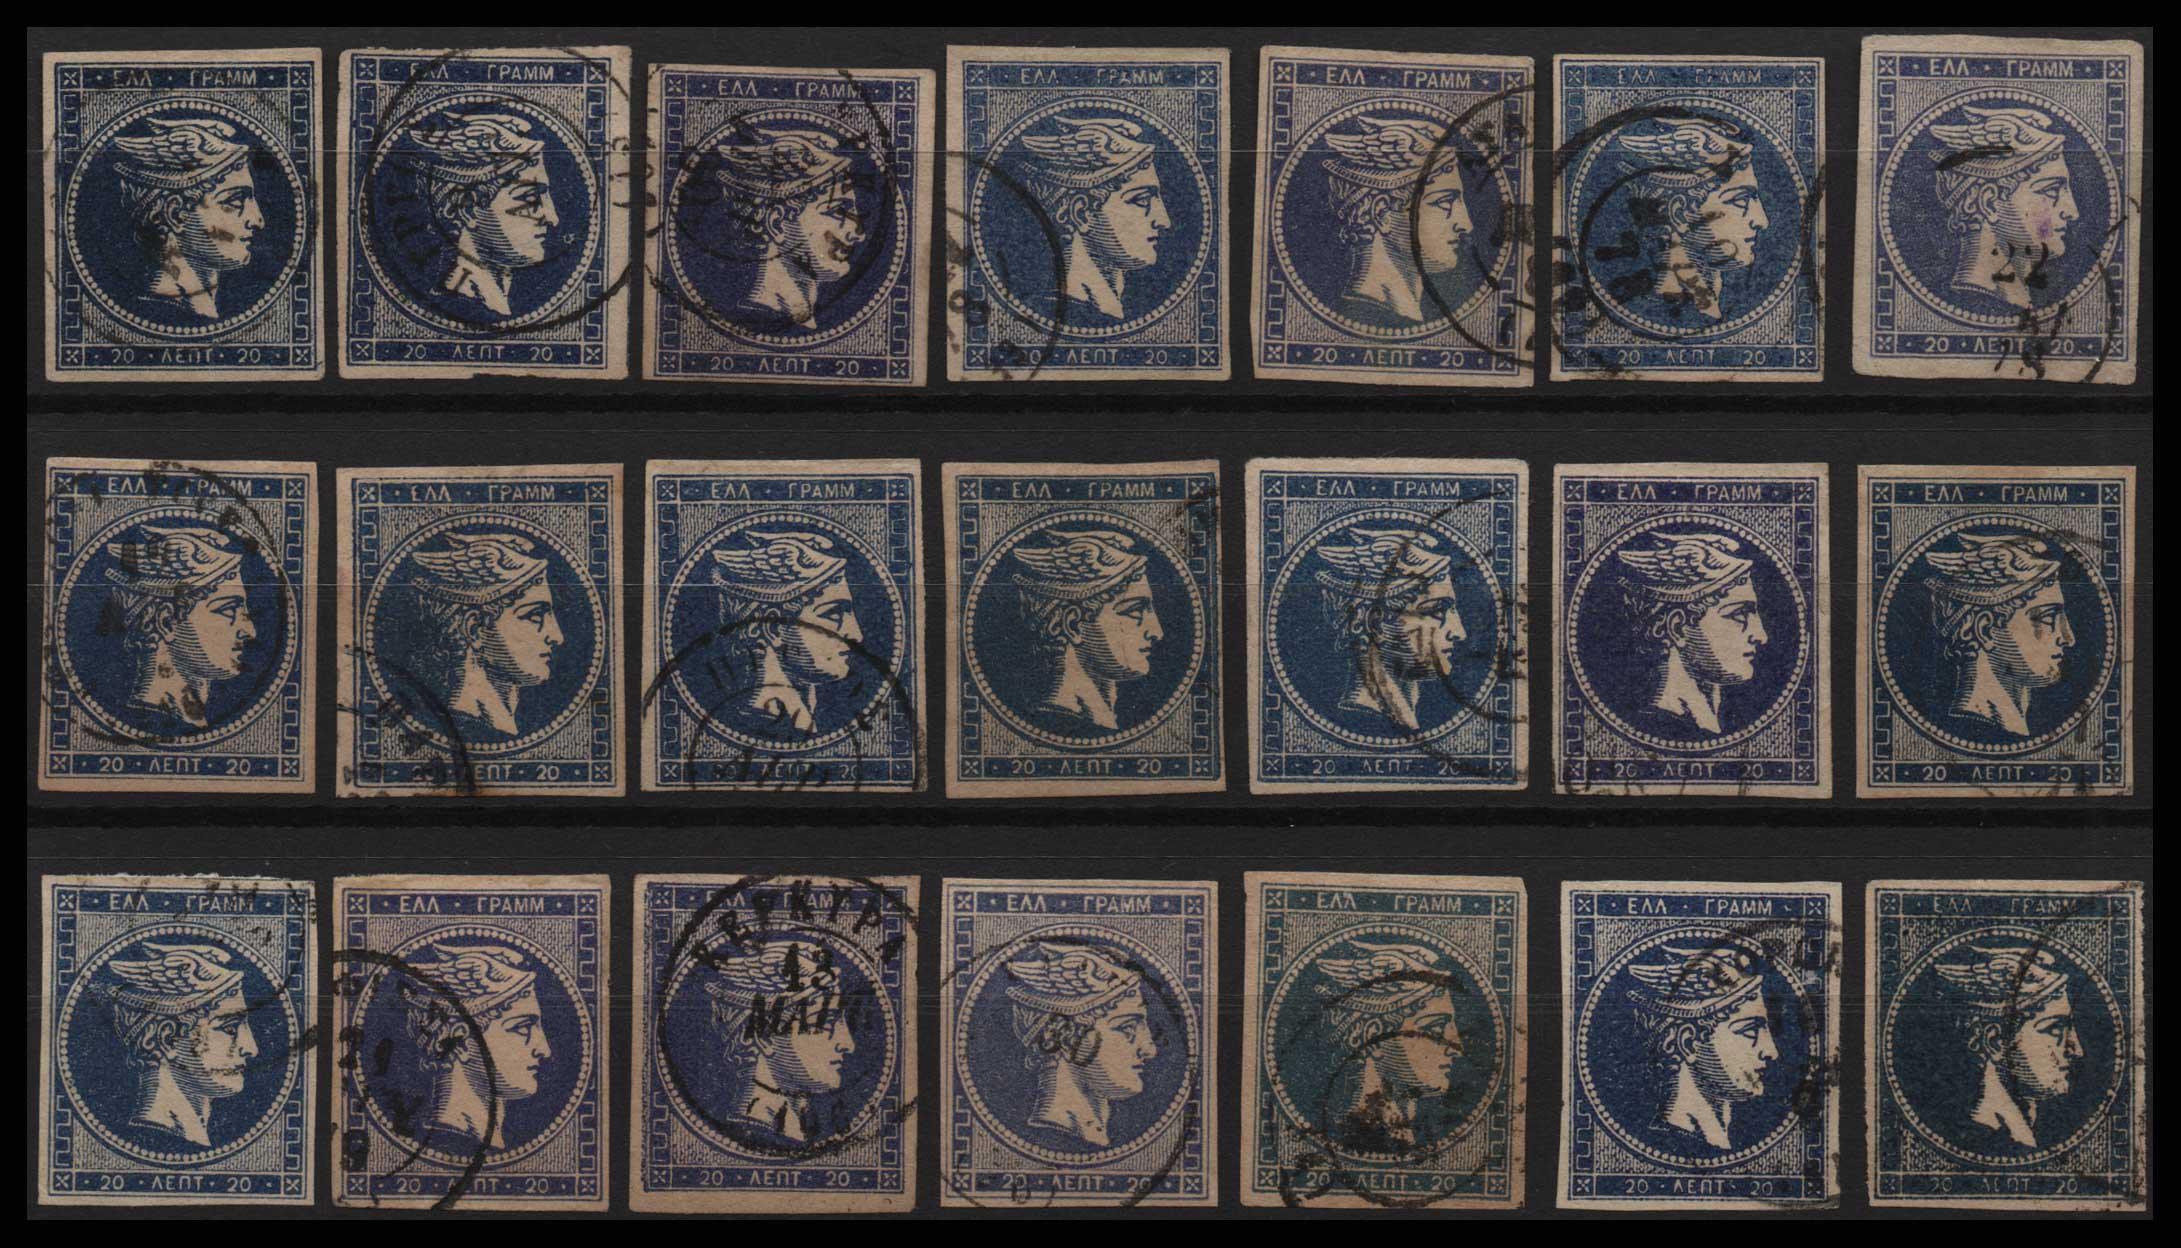 Lot 28 - -  LARGE HERMES HEAD large hermes head -  Athens Auctions Public Auction 83 General Stamp Sale